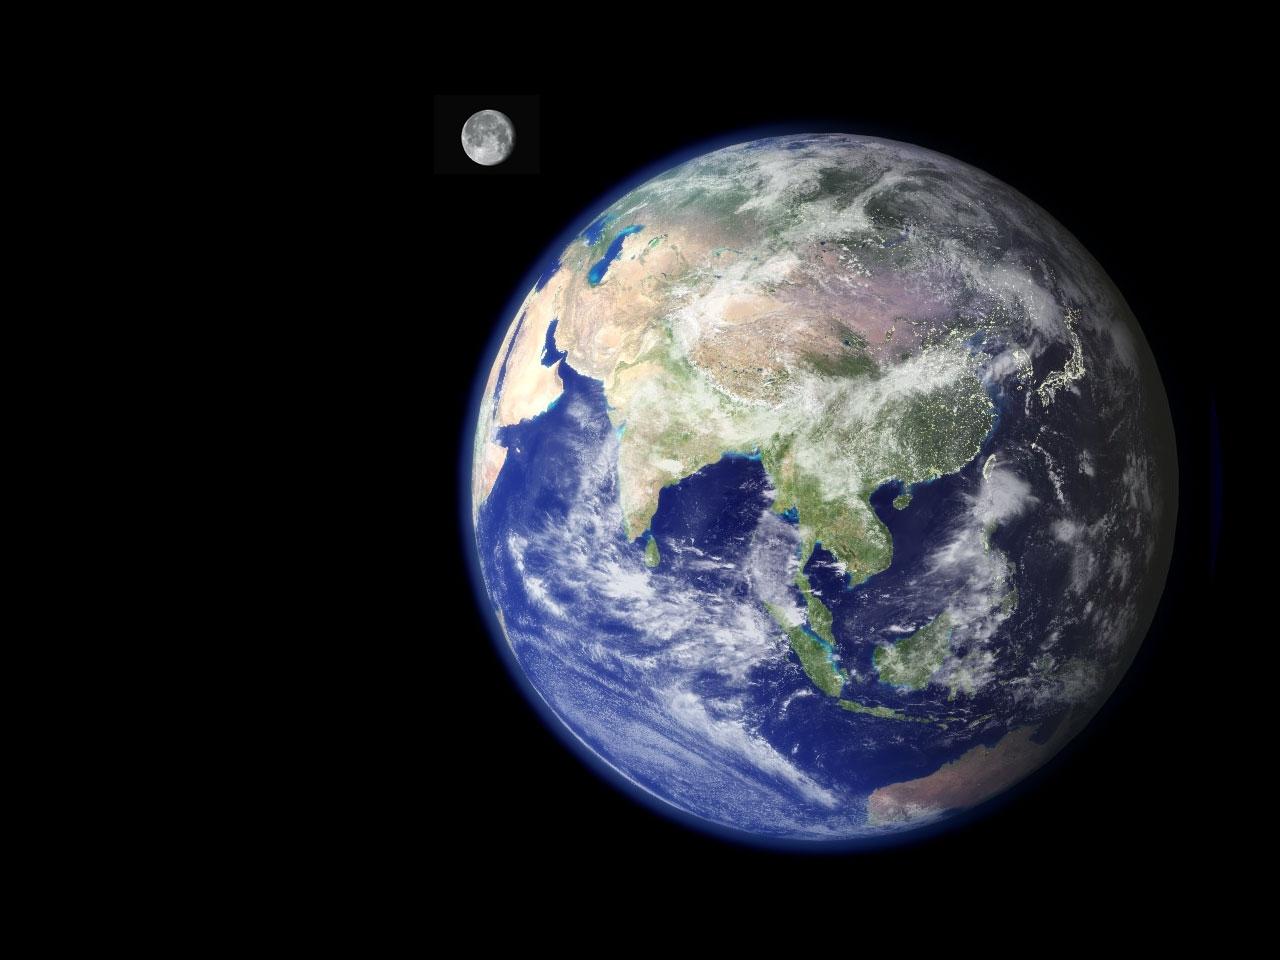 terre-lune_bis.jpg